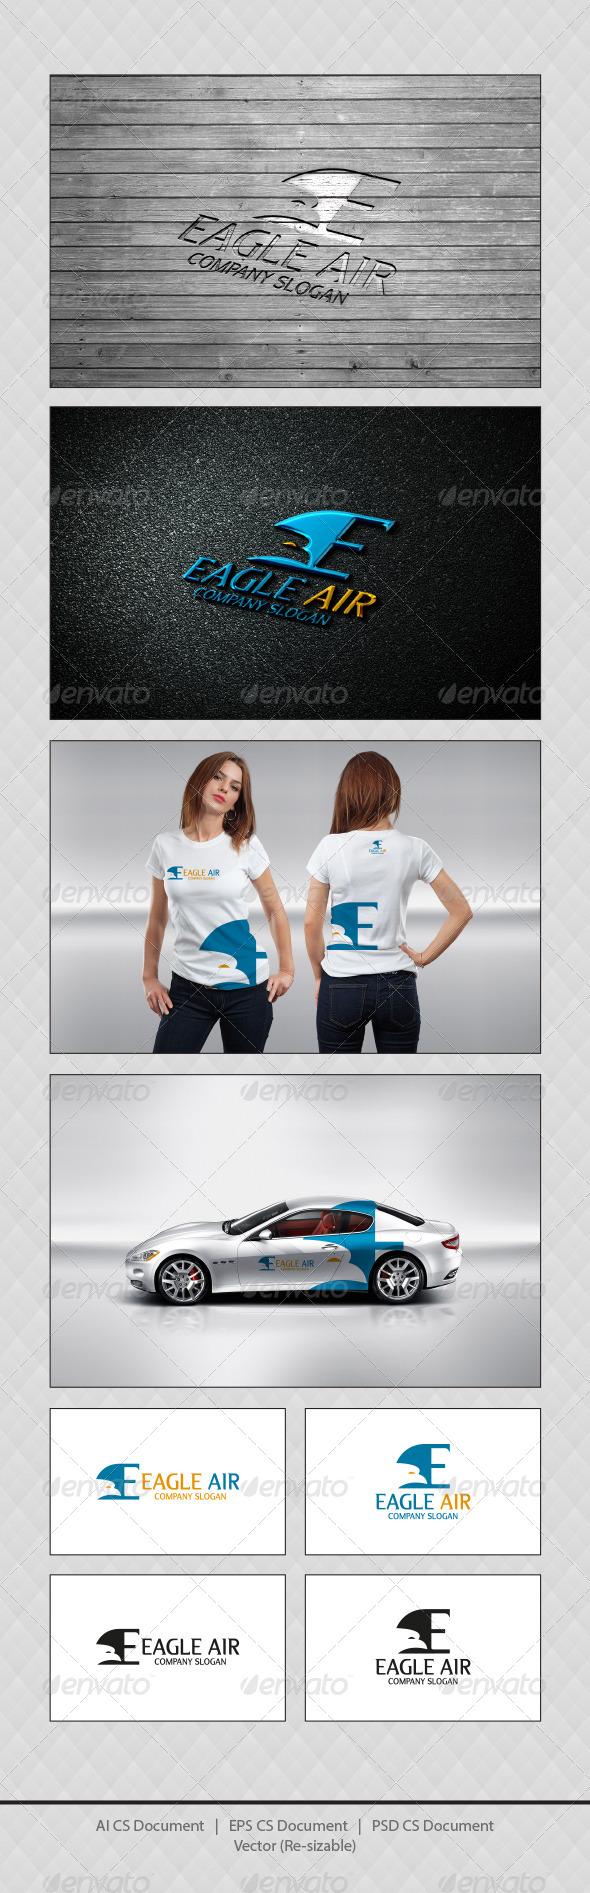 GraphicRiver Eagle Air E Logo Templates 4523994